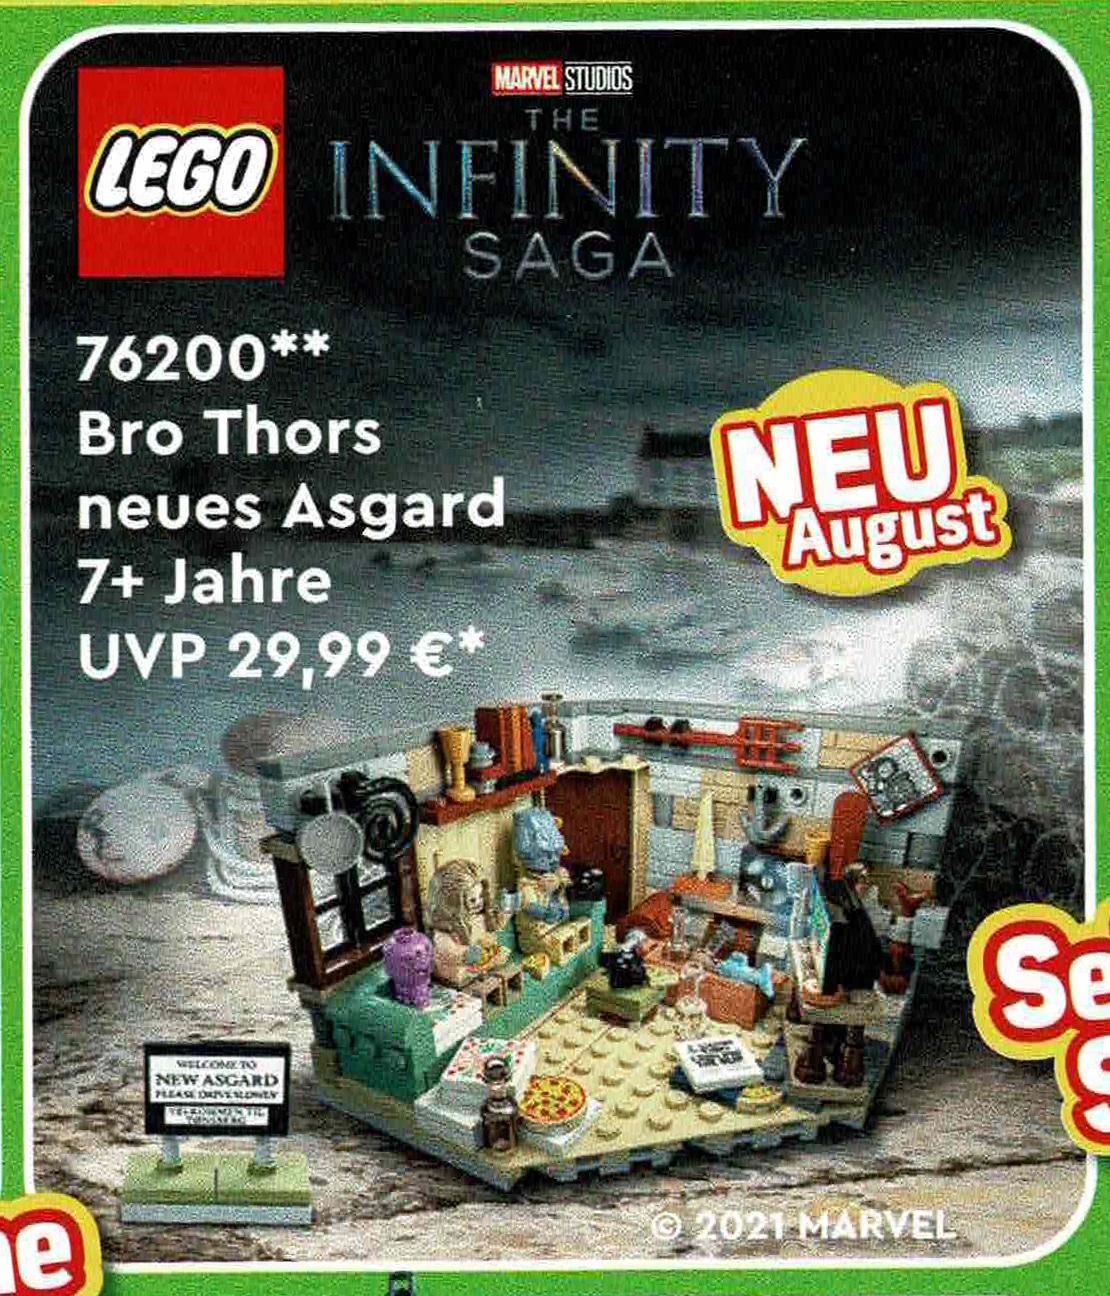 LEGO Marvel 76200 Bro Thors New Asgard